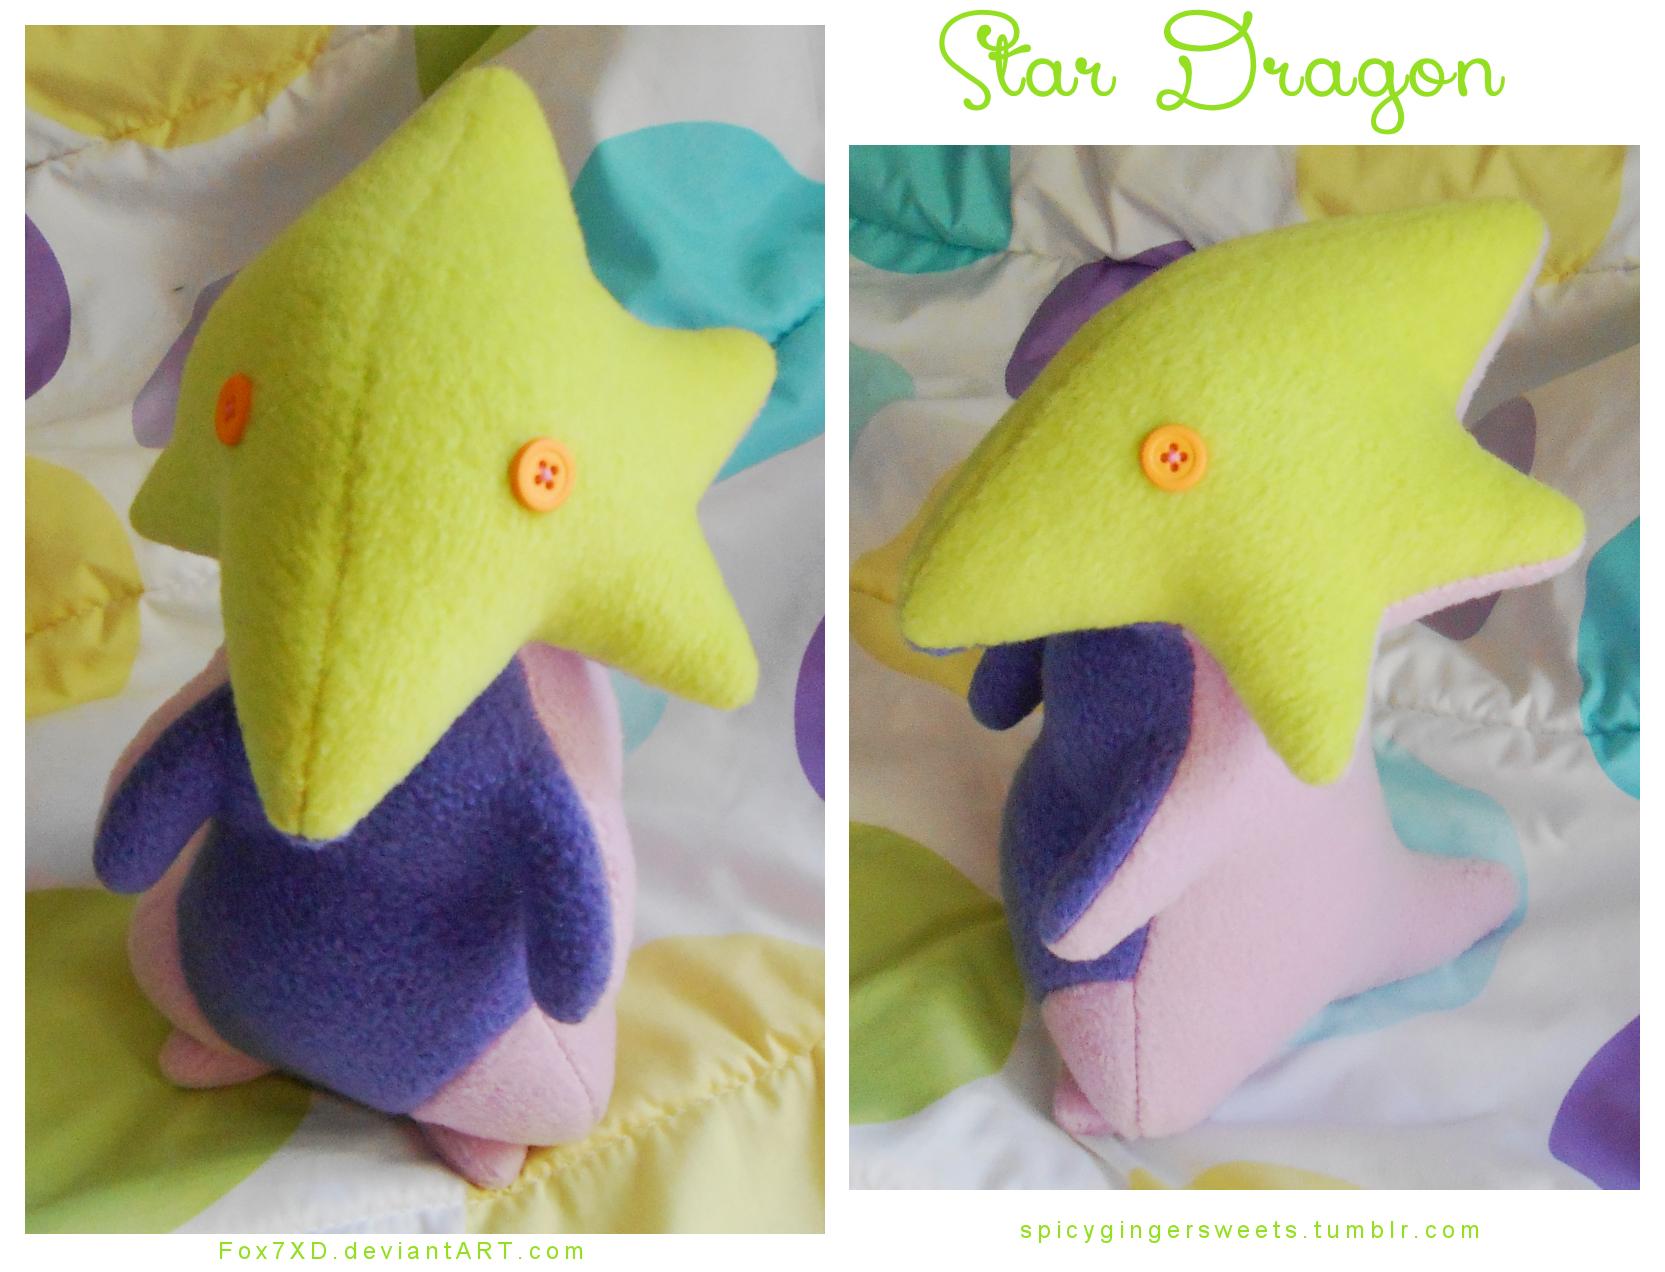 Star Dragon 3 by Fox7XD